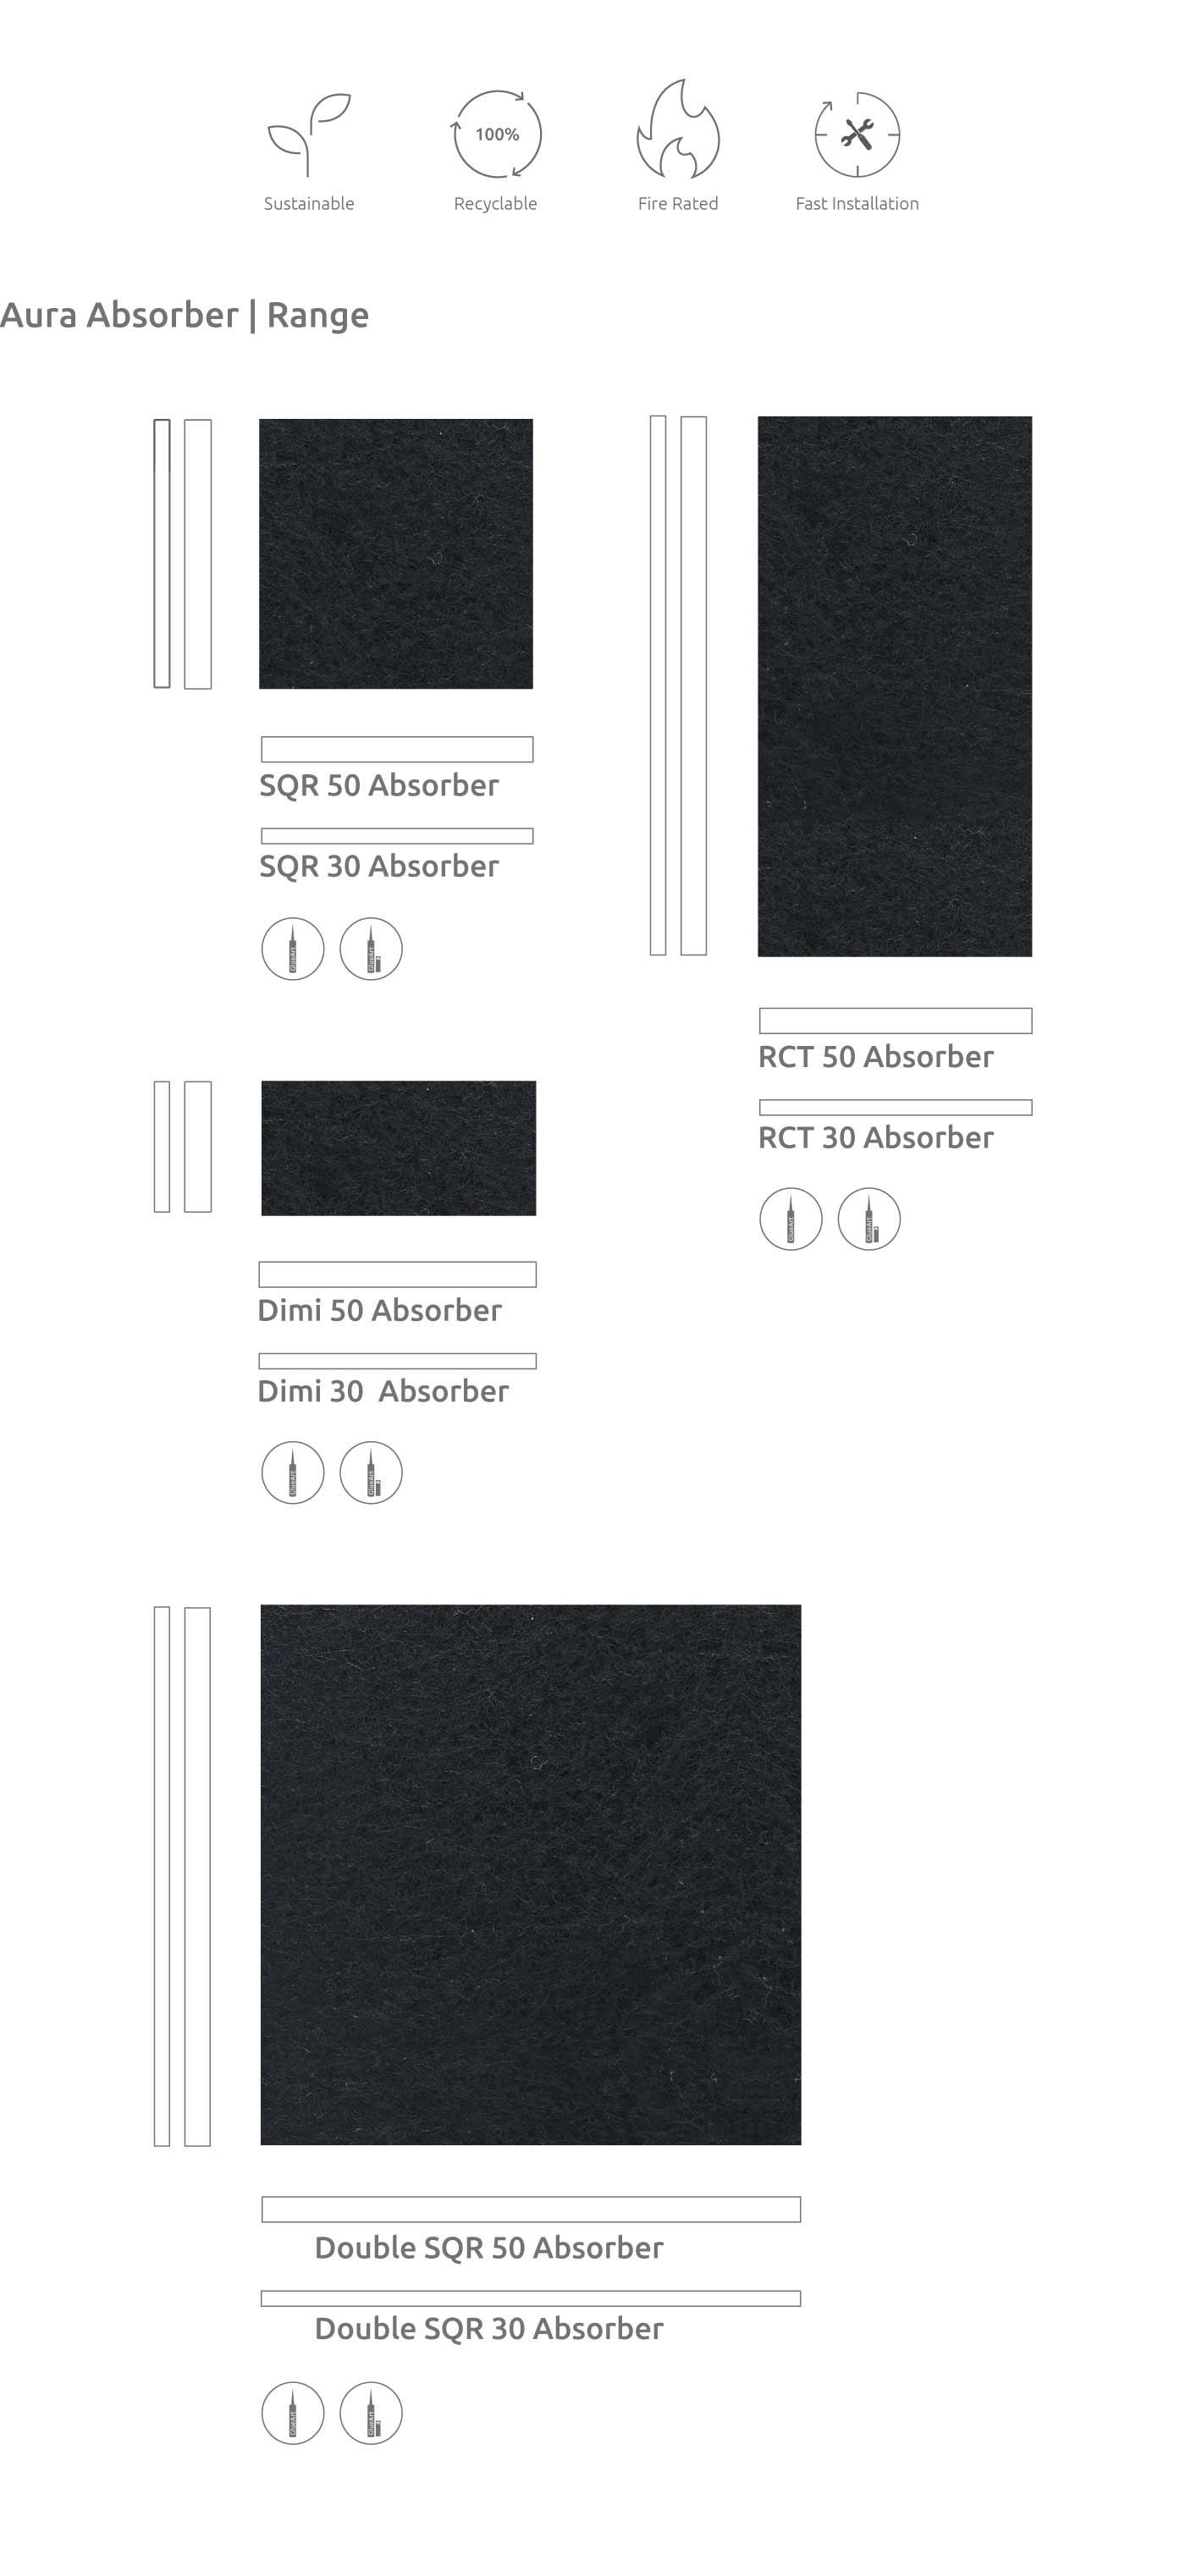 Artnovion product aura absorber range 5d4f847907